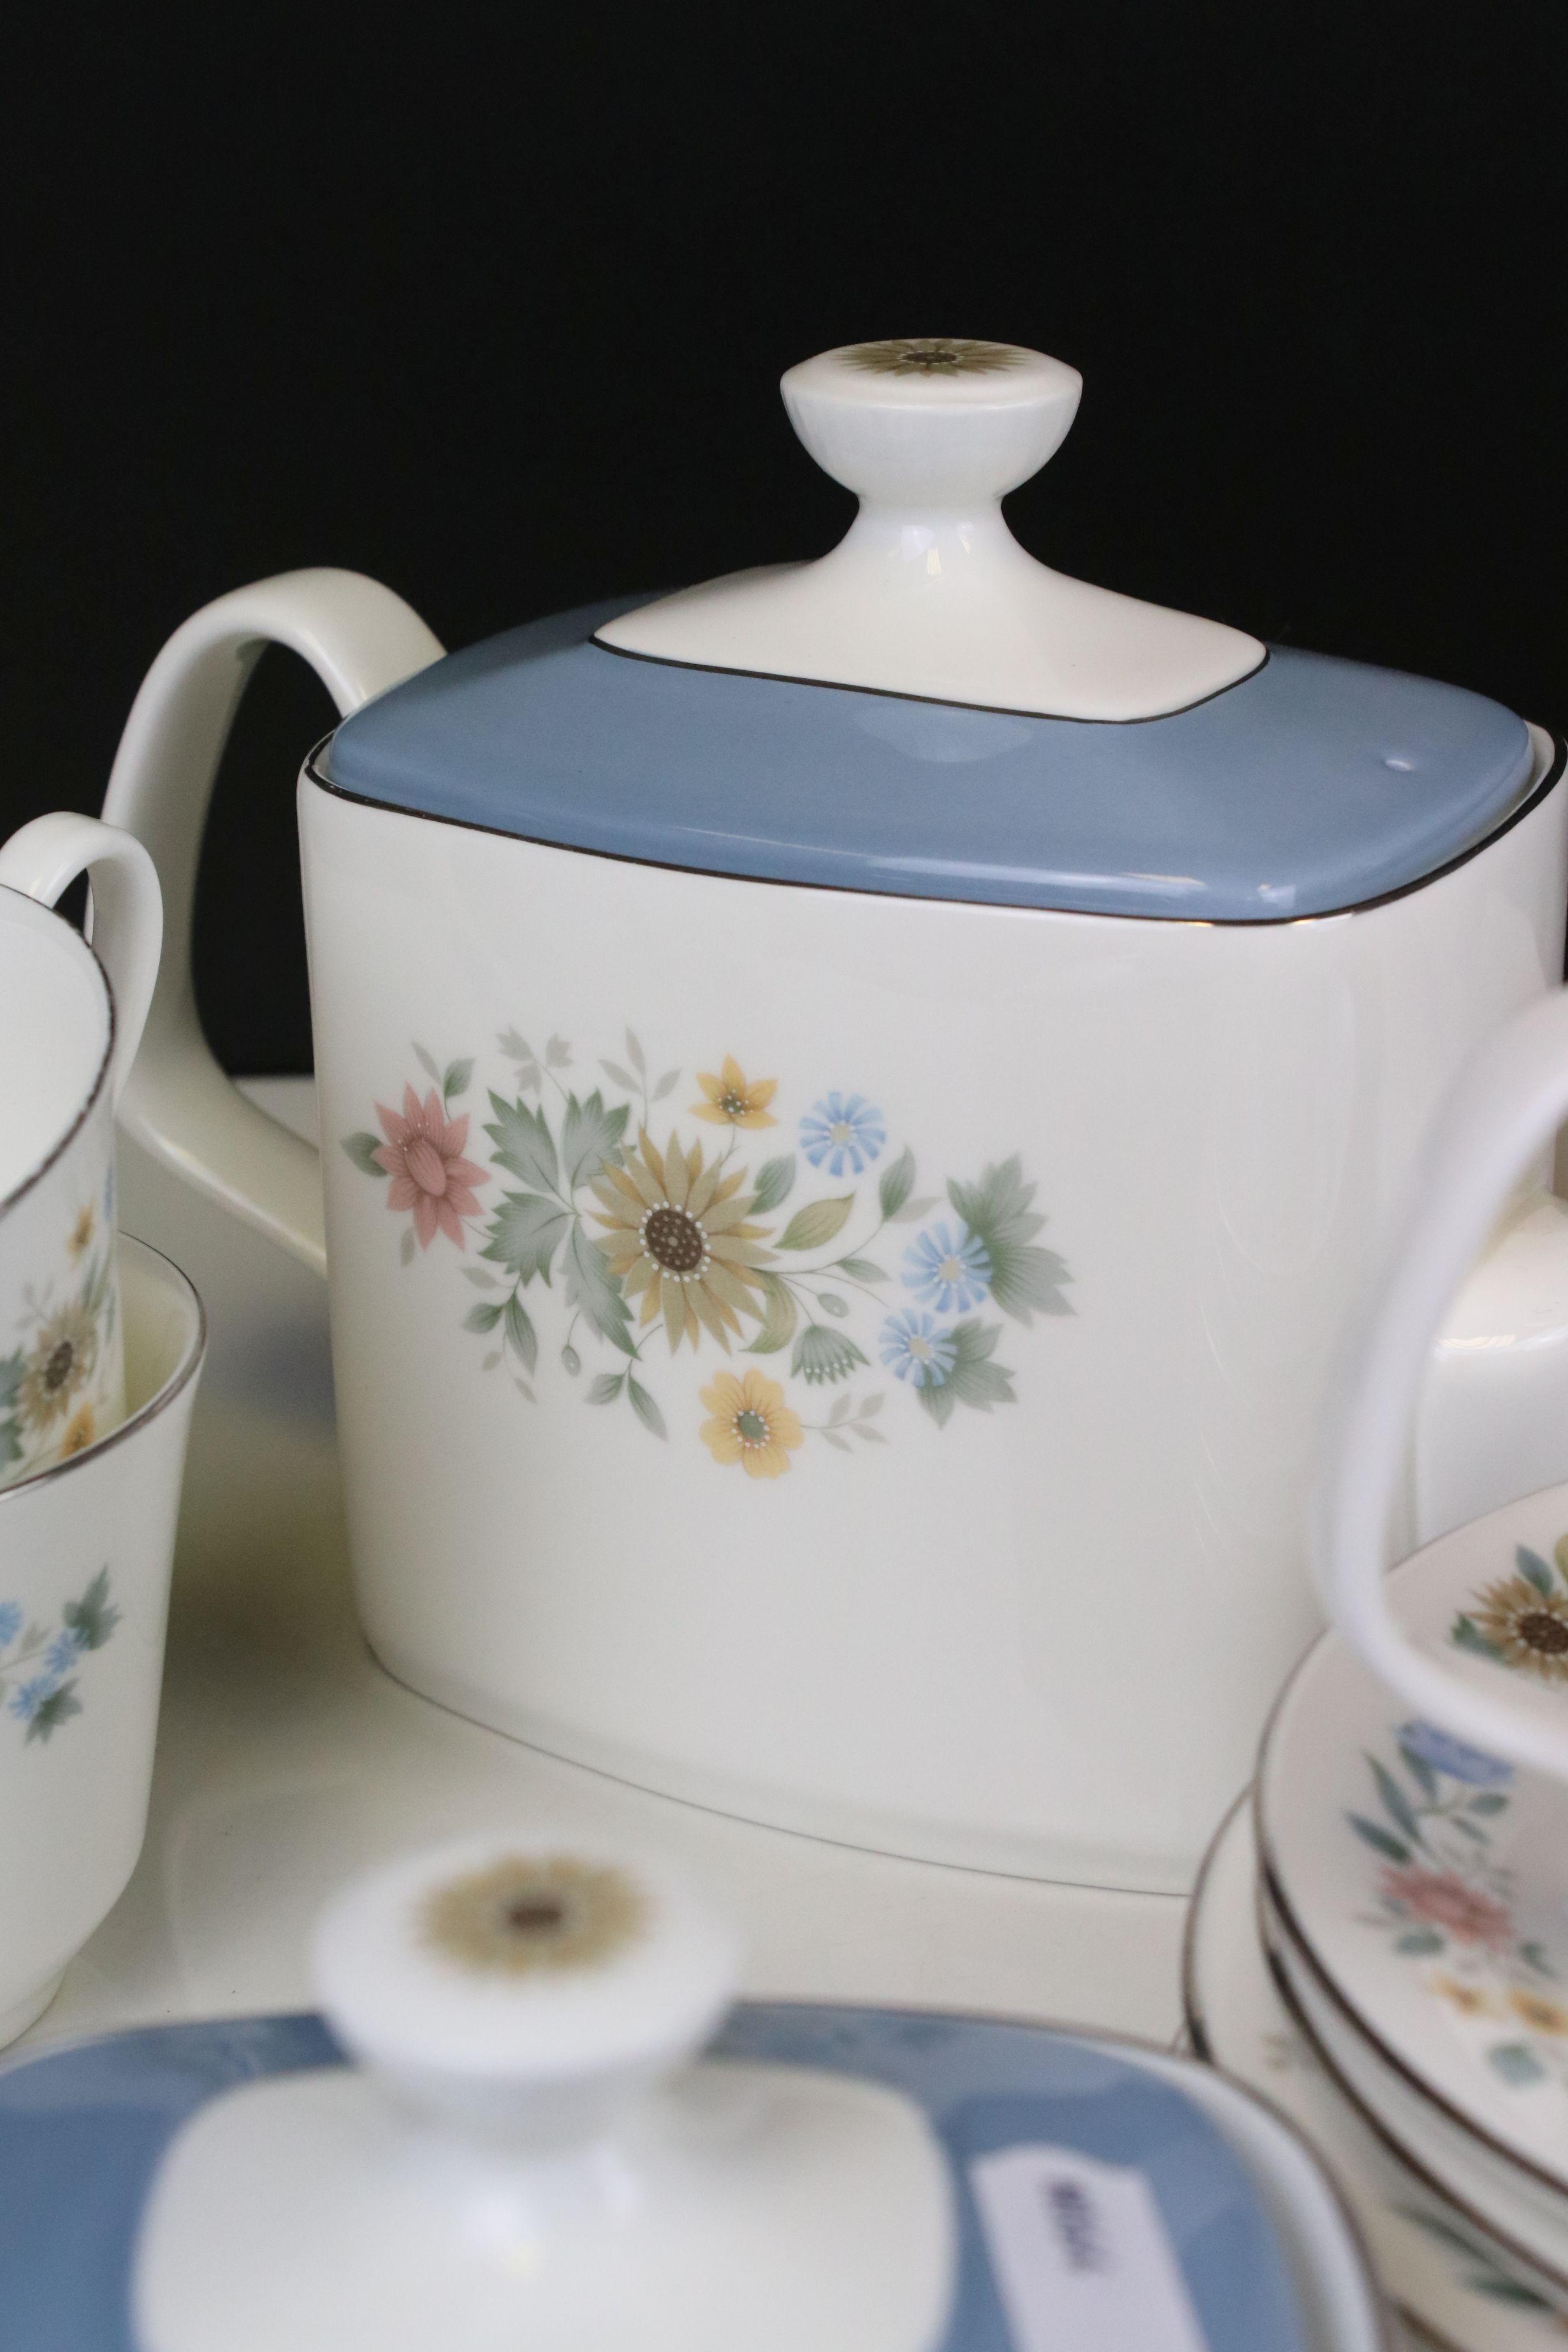 Royal Doulton ' Pastorale ' Tea Set comprising Two Teapots, Milk, Sugar, 6 Cups and 7 Saucers - Image 3 of 7